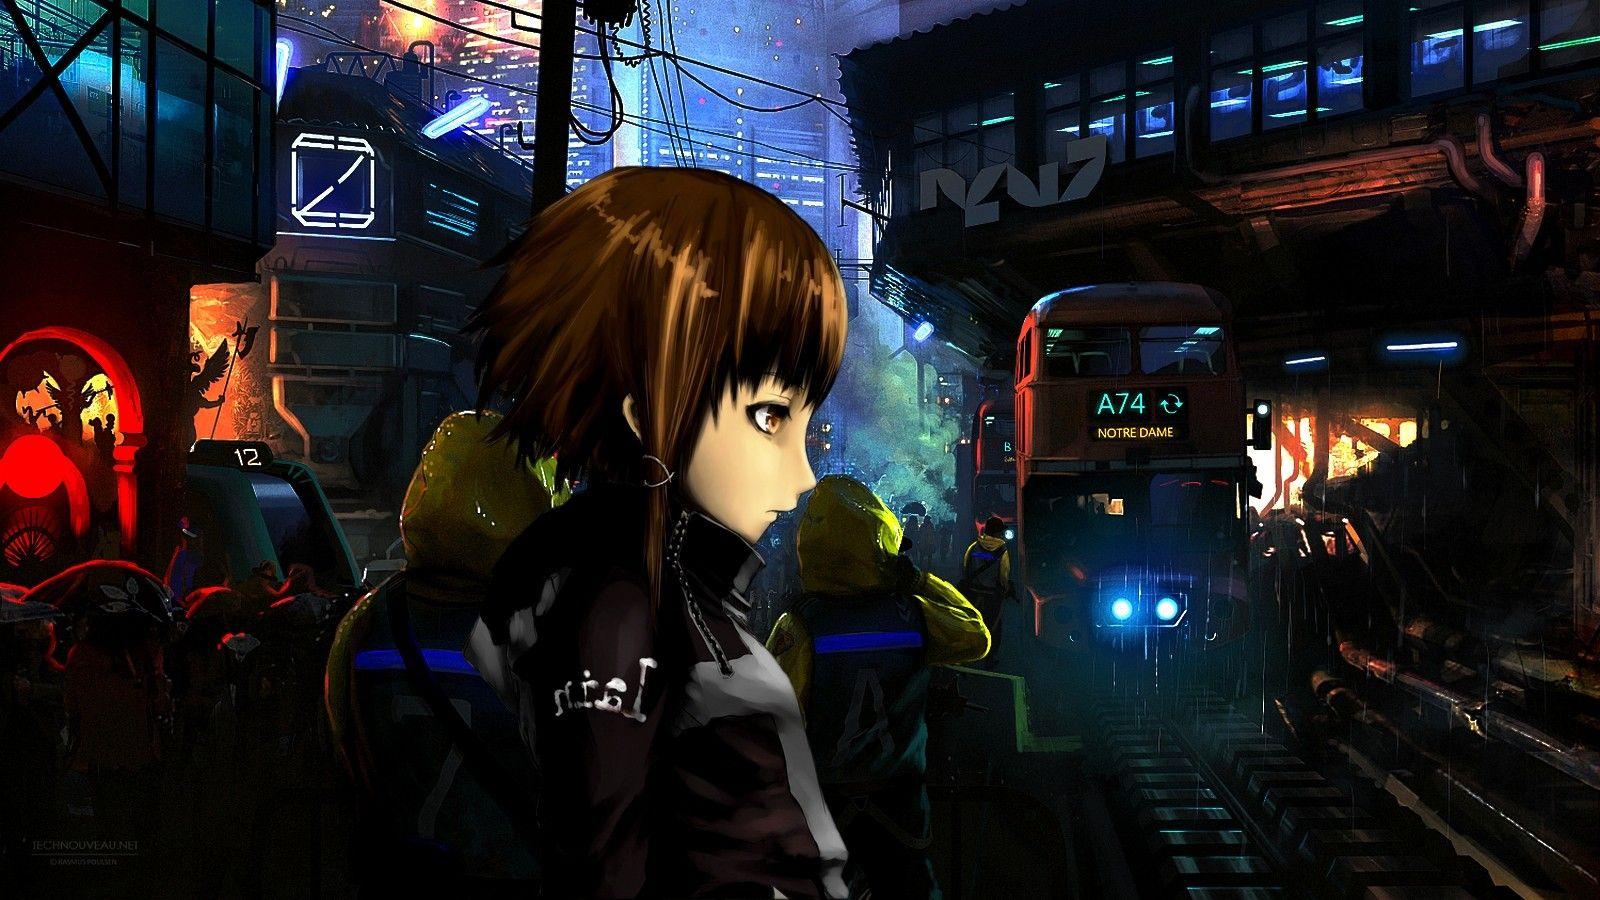 cyberpunk anime serial experiments lain traffic